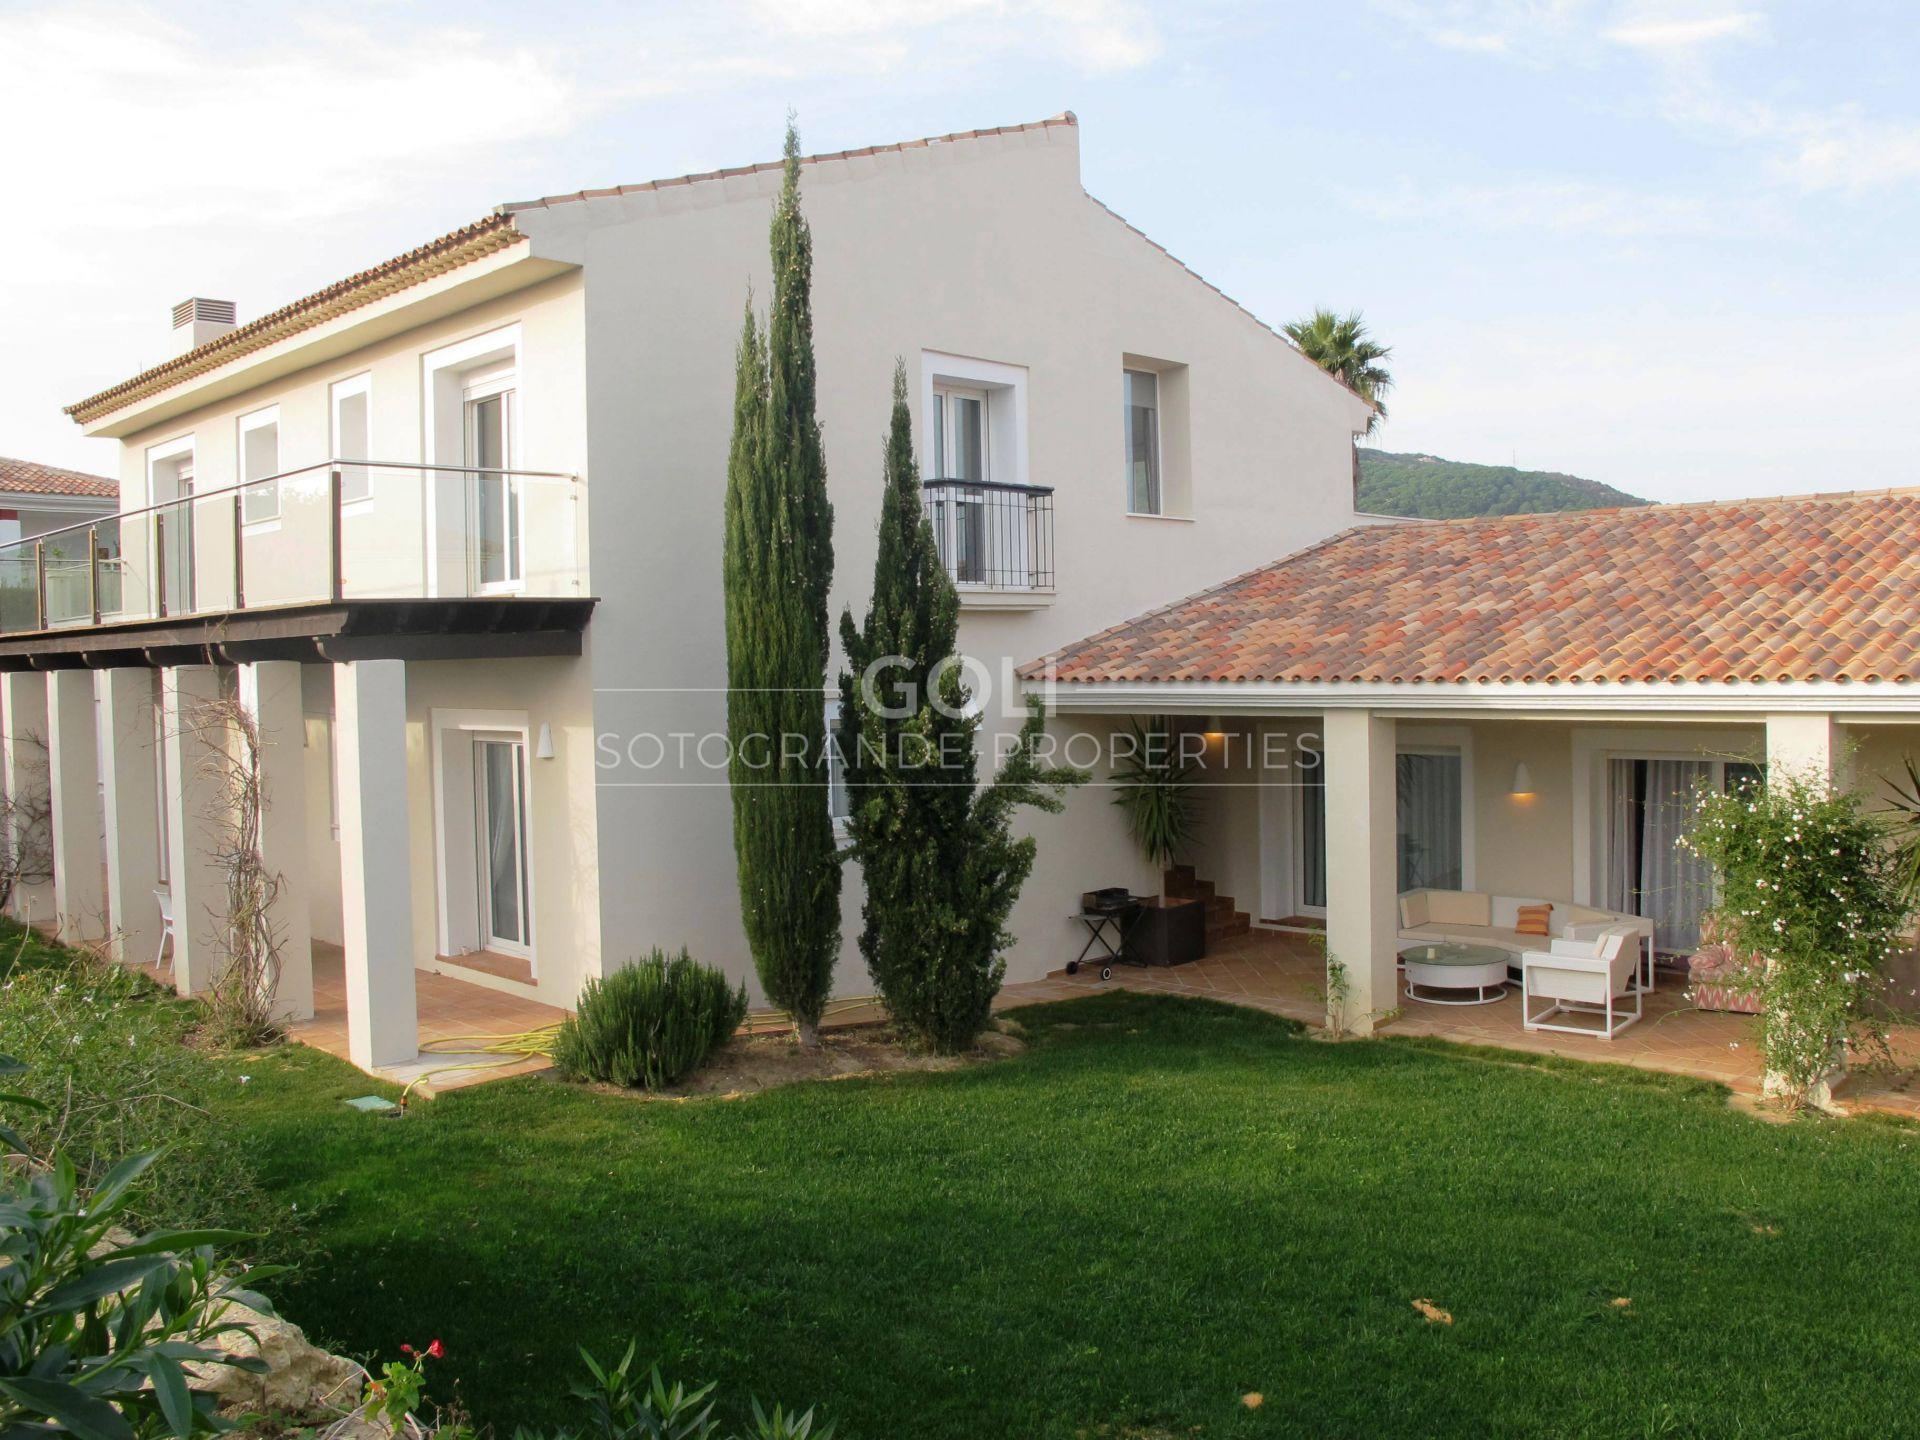 Comfortable villa in an excellent location